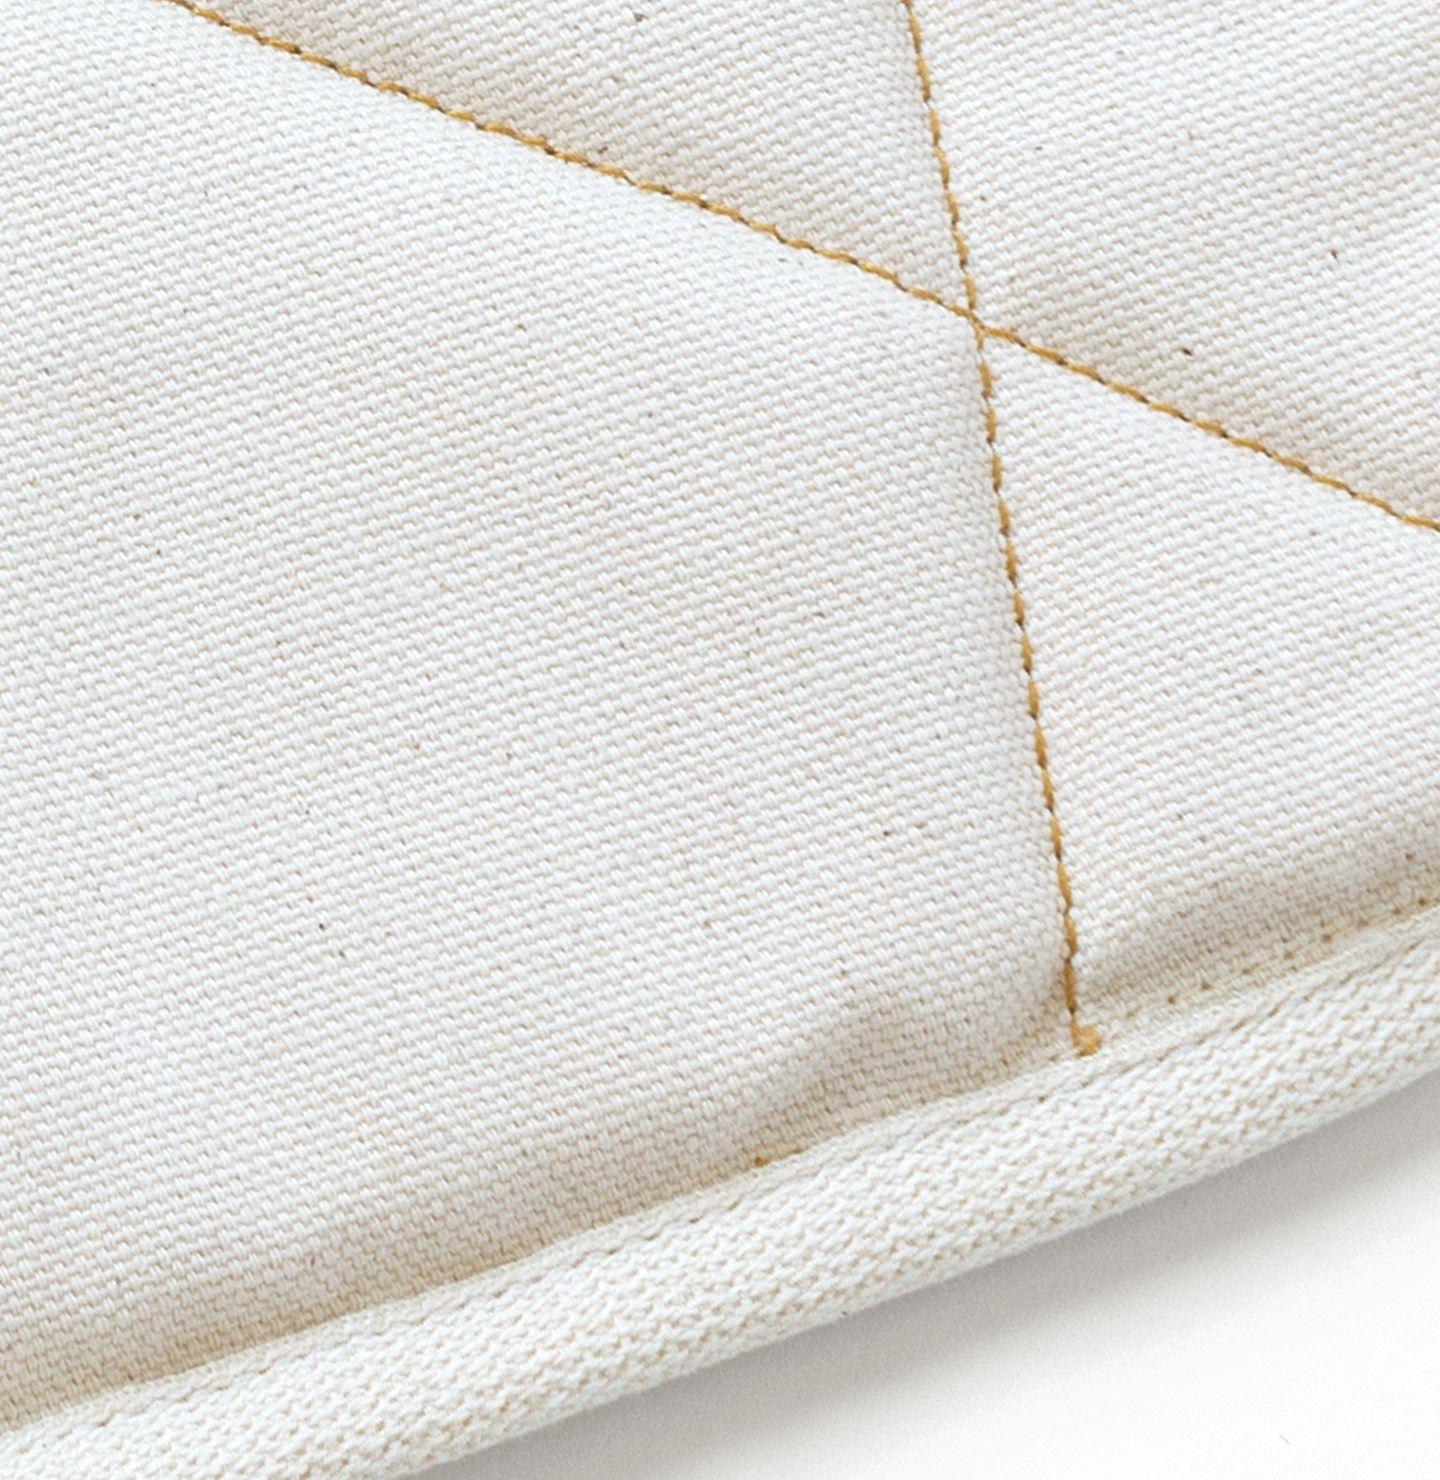 Zig Zag Accent Stitching